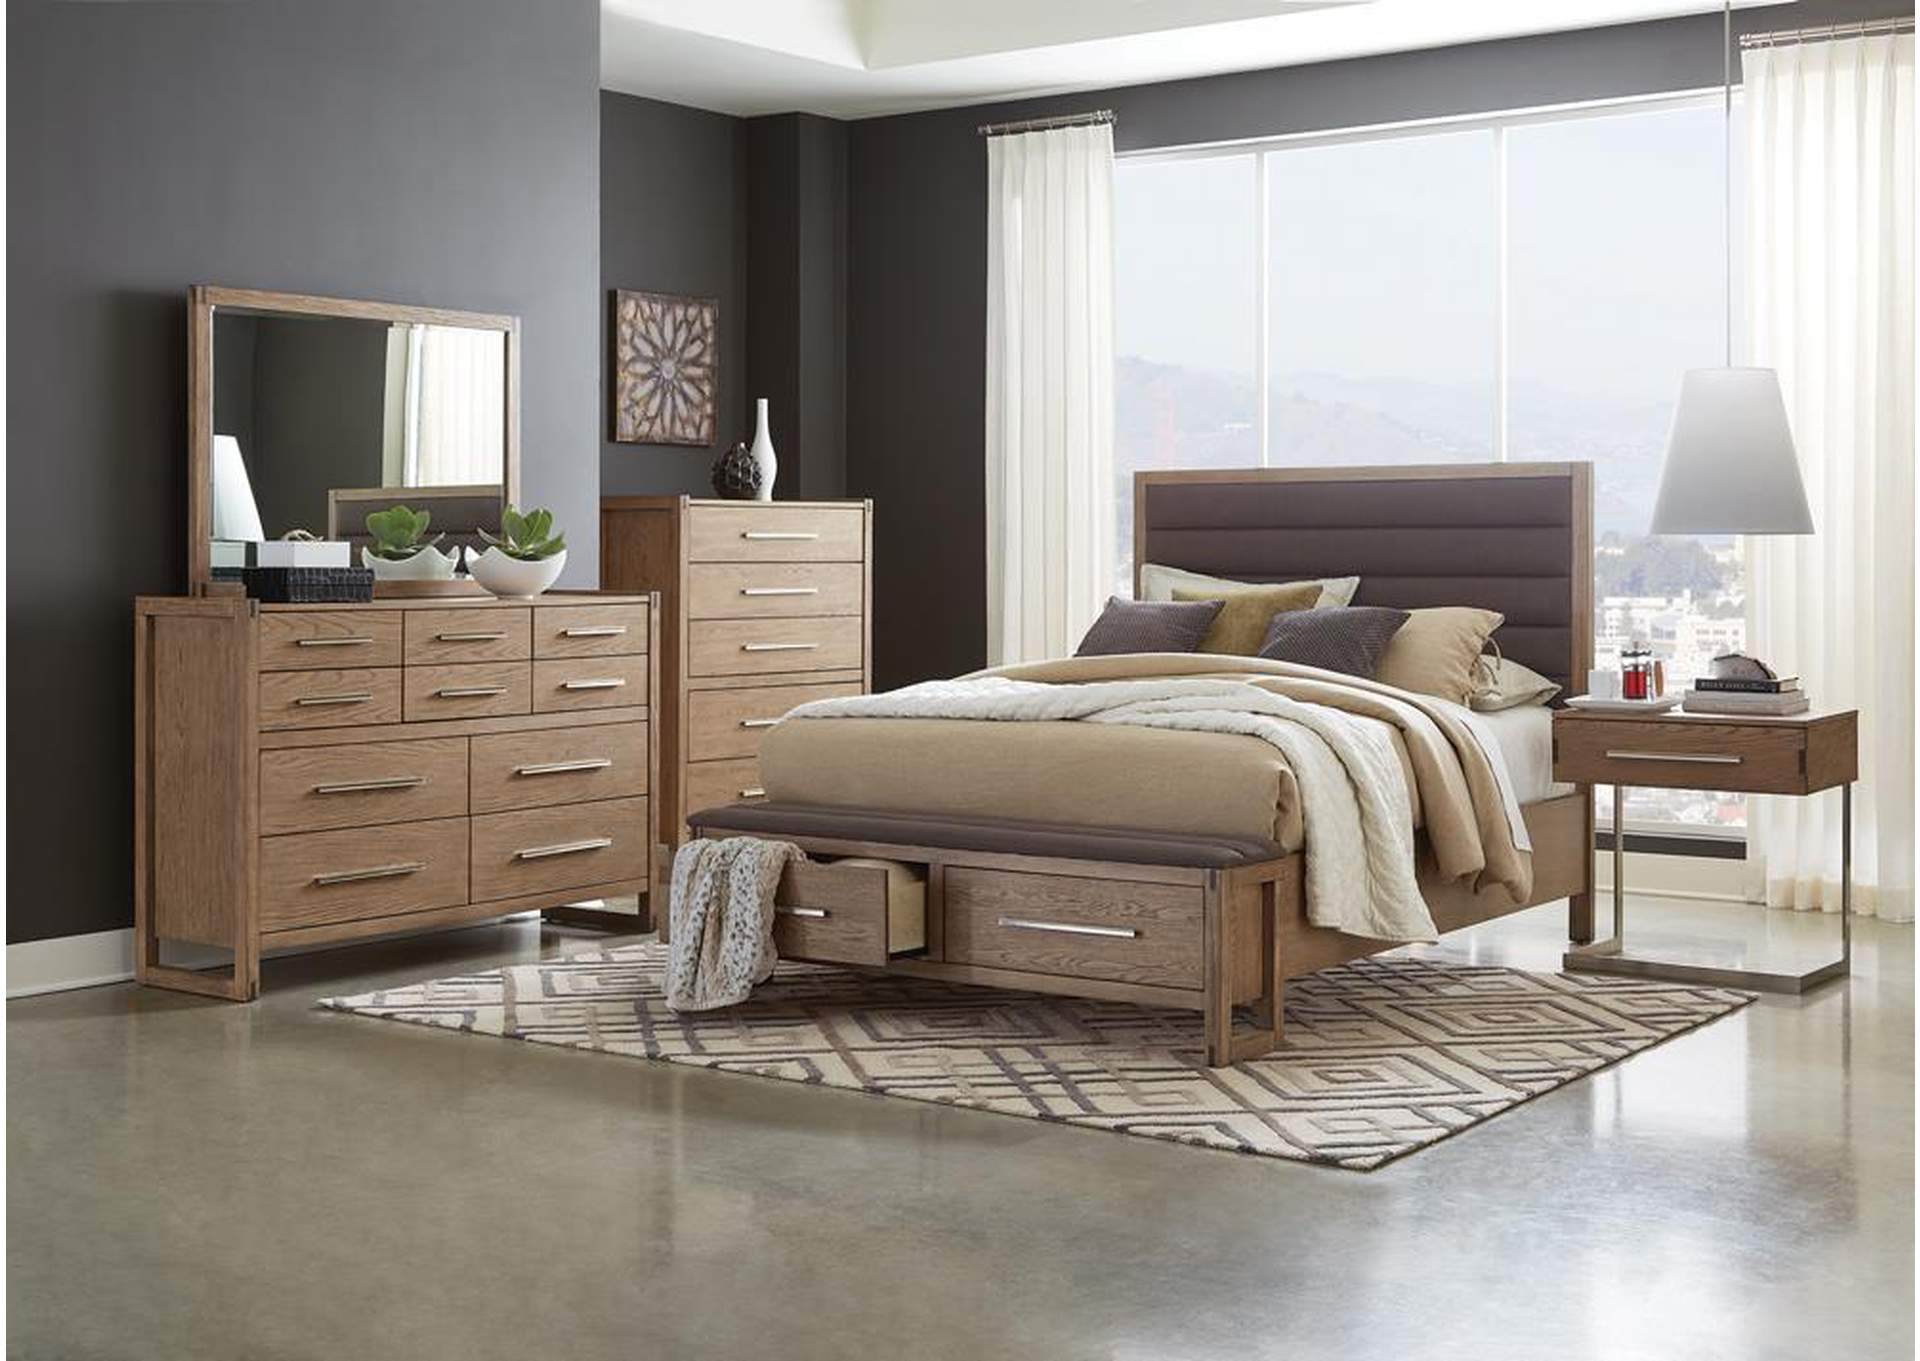 Smithson Alabaster 4 Piece California King Bedroom Set Lo S Art Furniture